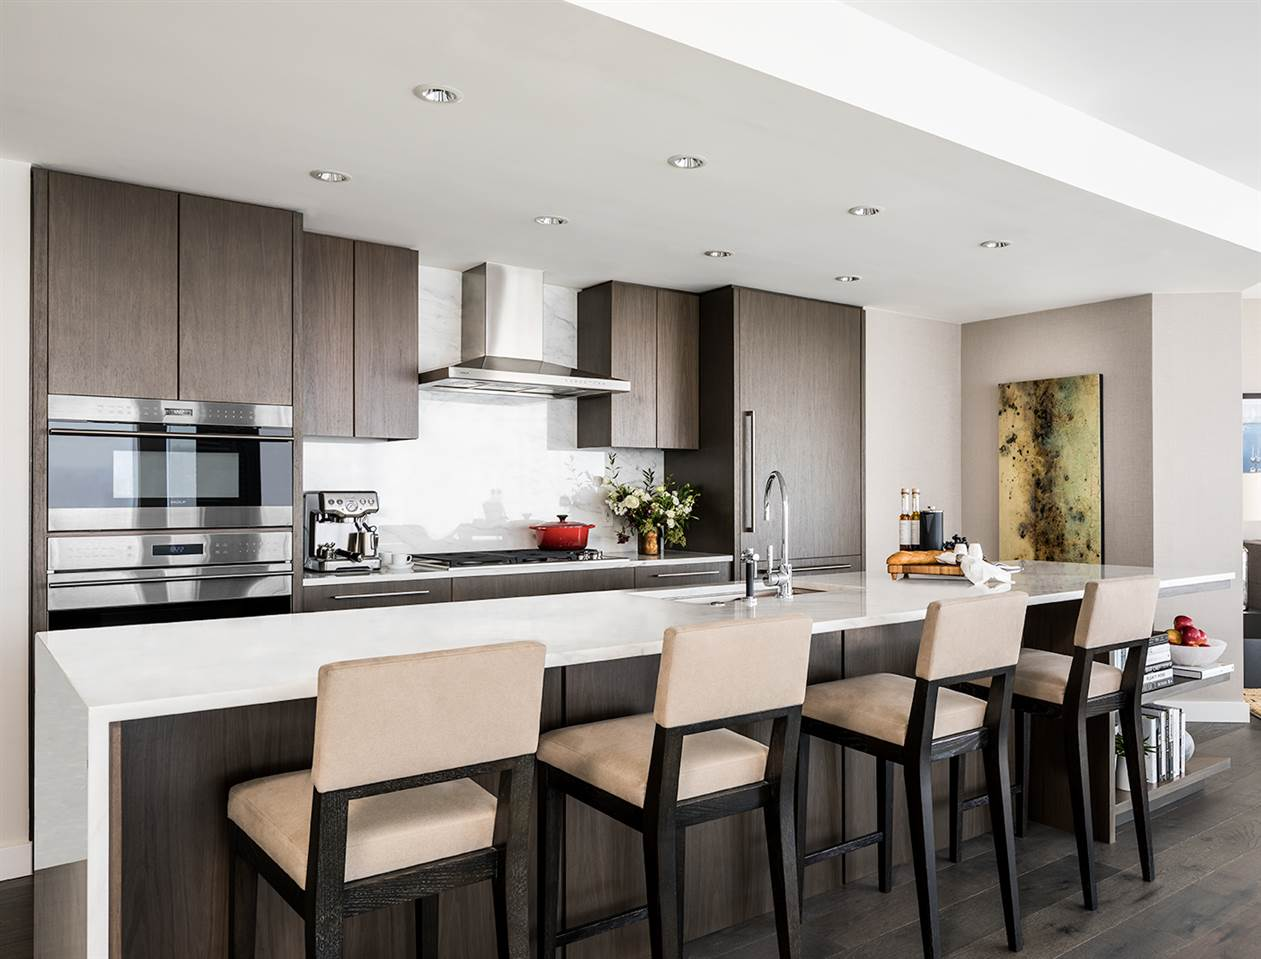 Condo Apartment at 1403 1335 HOWE STREET, Unit 1403, Vancouver West, British Columbia. Image 2